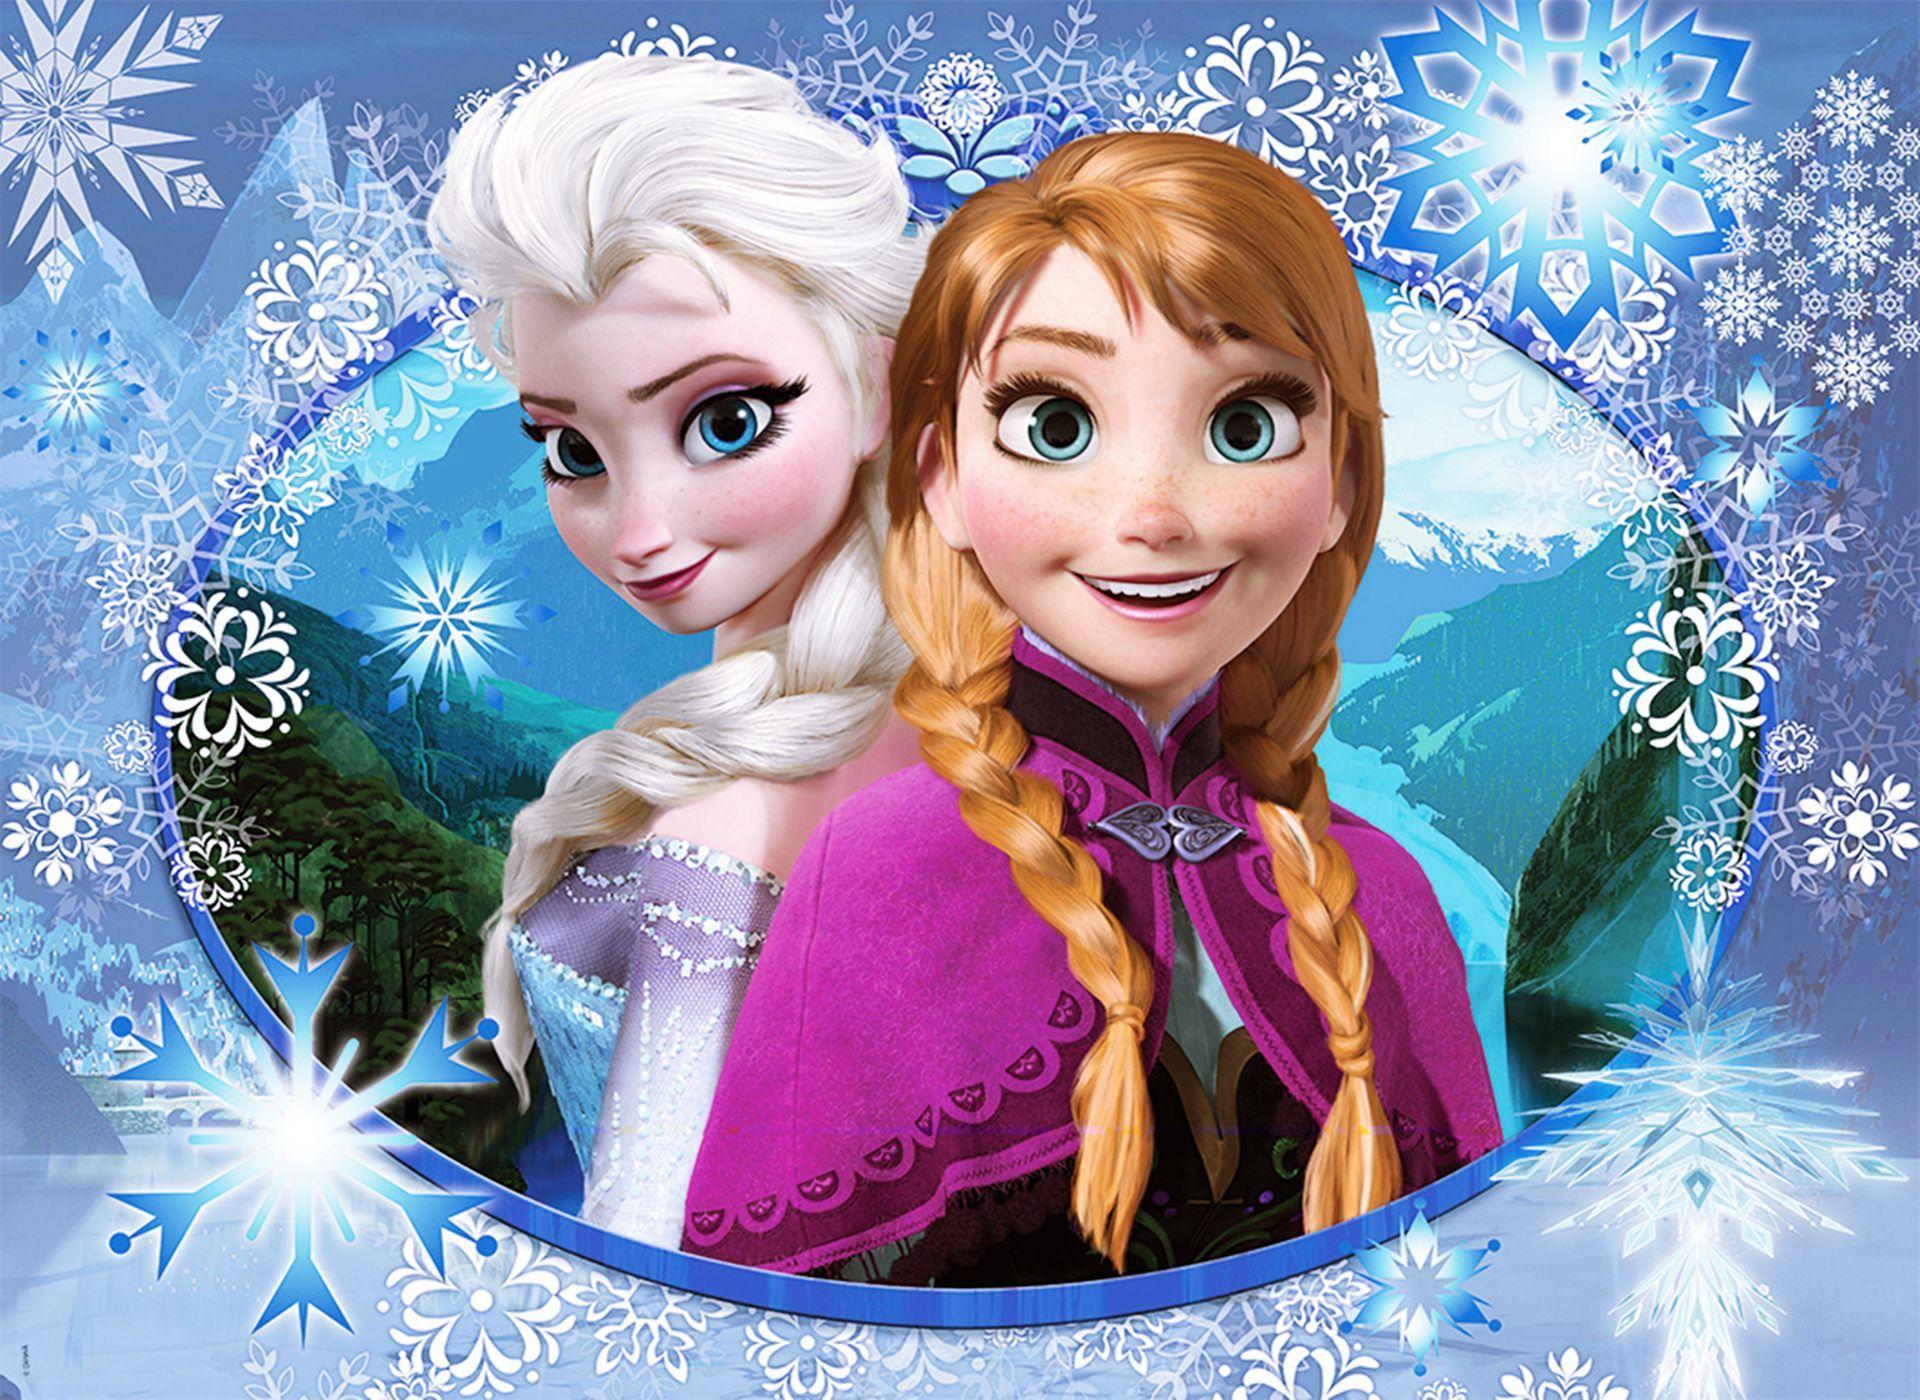 pinchrista woite on frozen | pinterest | elsa, elsa pictures and